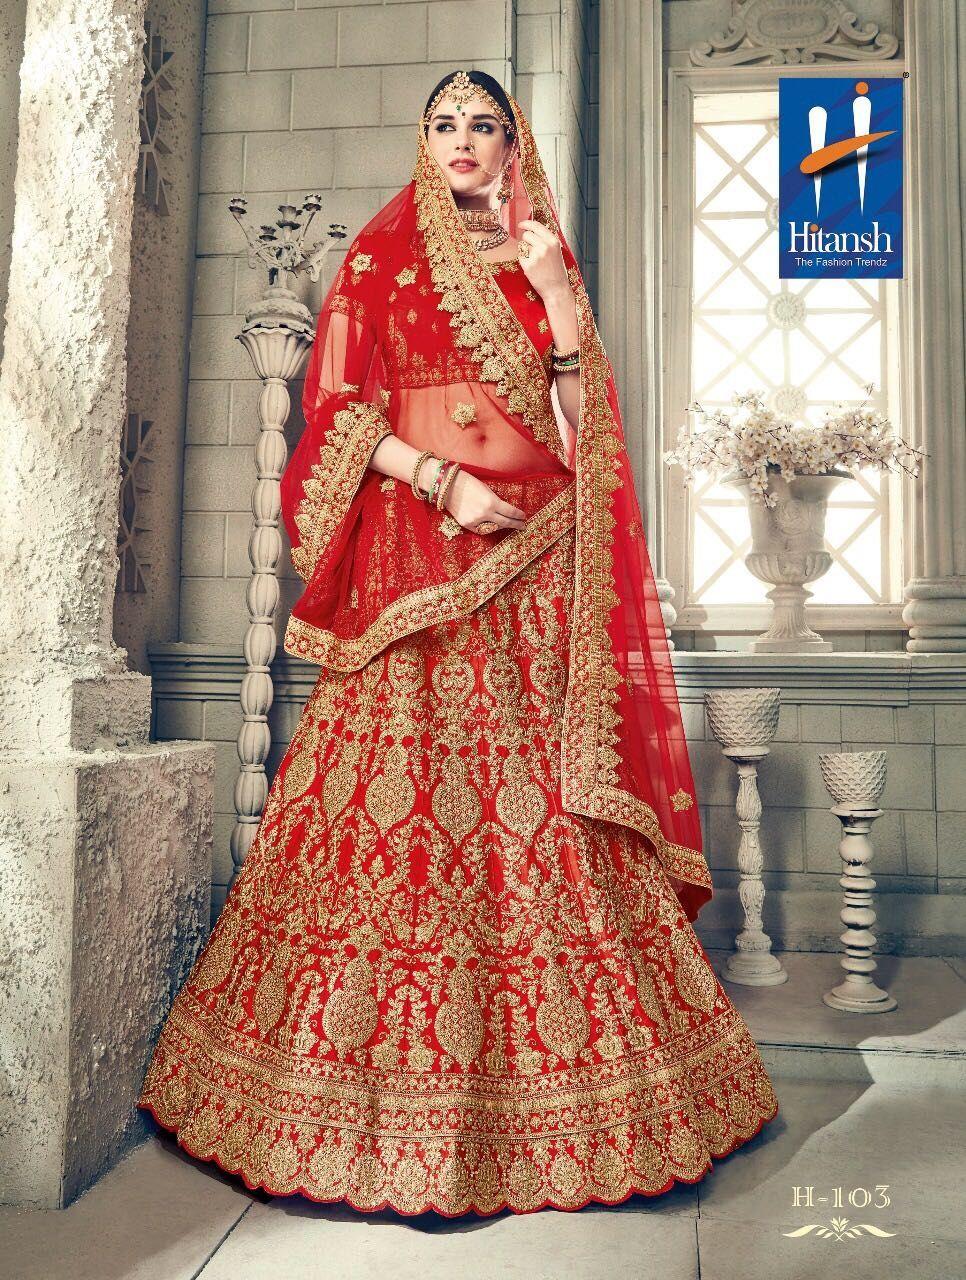 fc435d543a Hitansh Vivah Exclusive Red Colour Heavy Embroidery Designer Bridal Lehenga.  Design No-H-103. Lehenga-Silk. Blouse-Silk. Dupatta-Net.